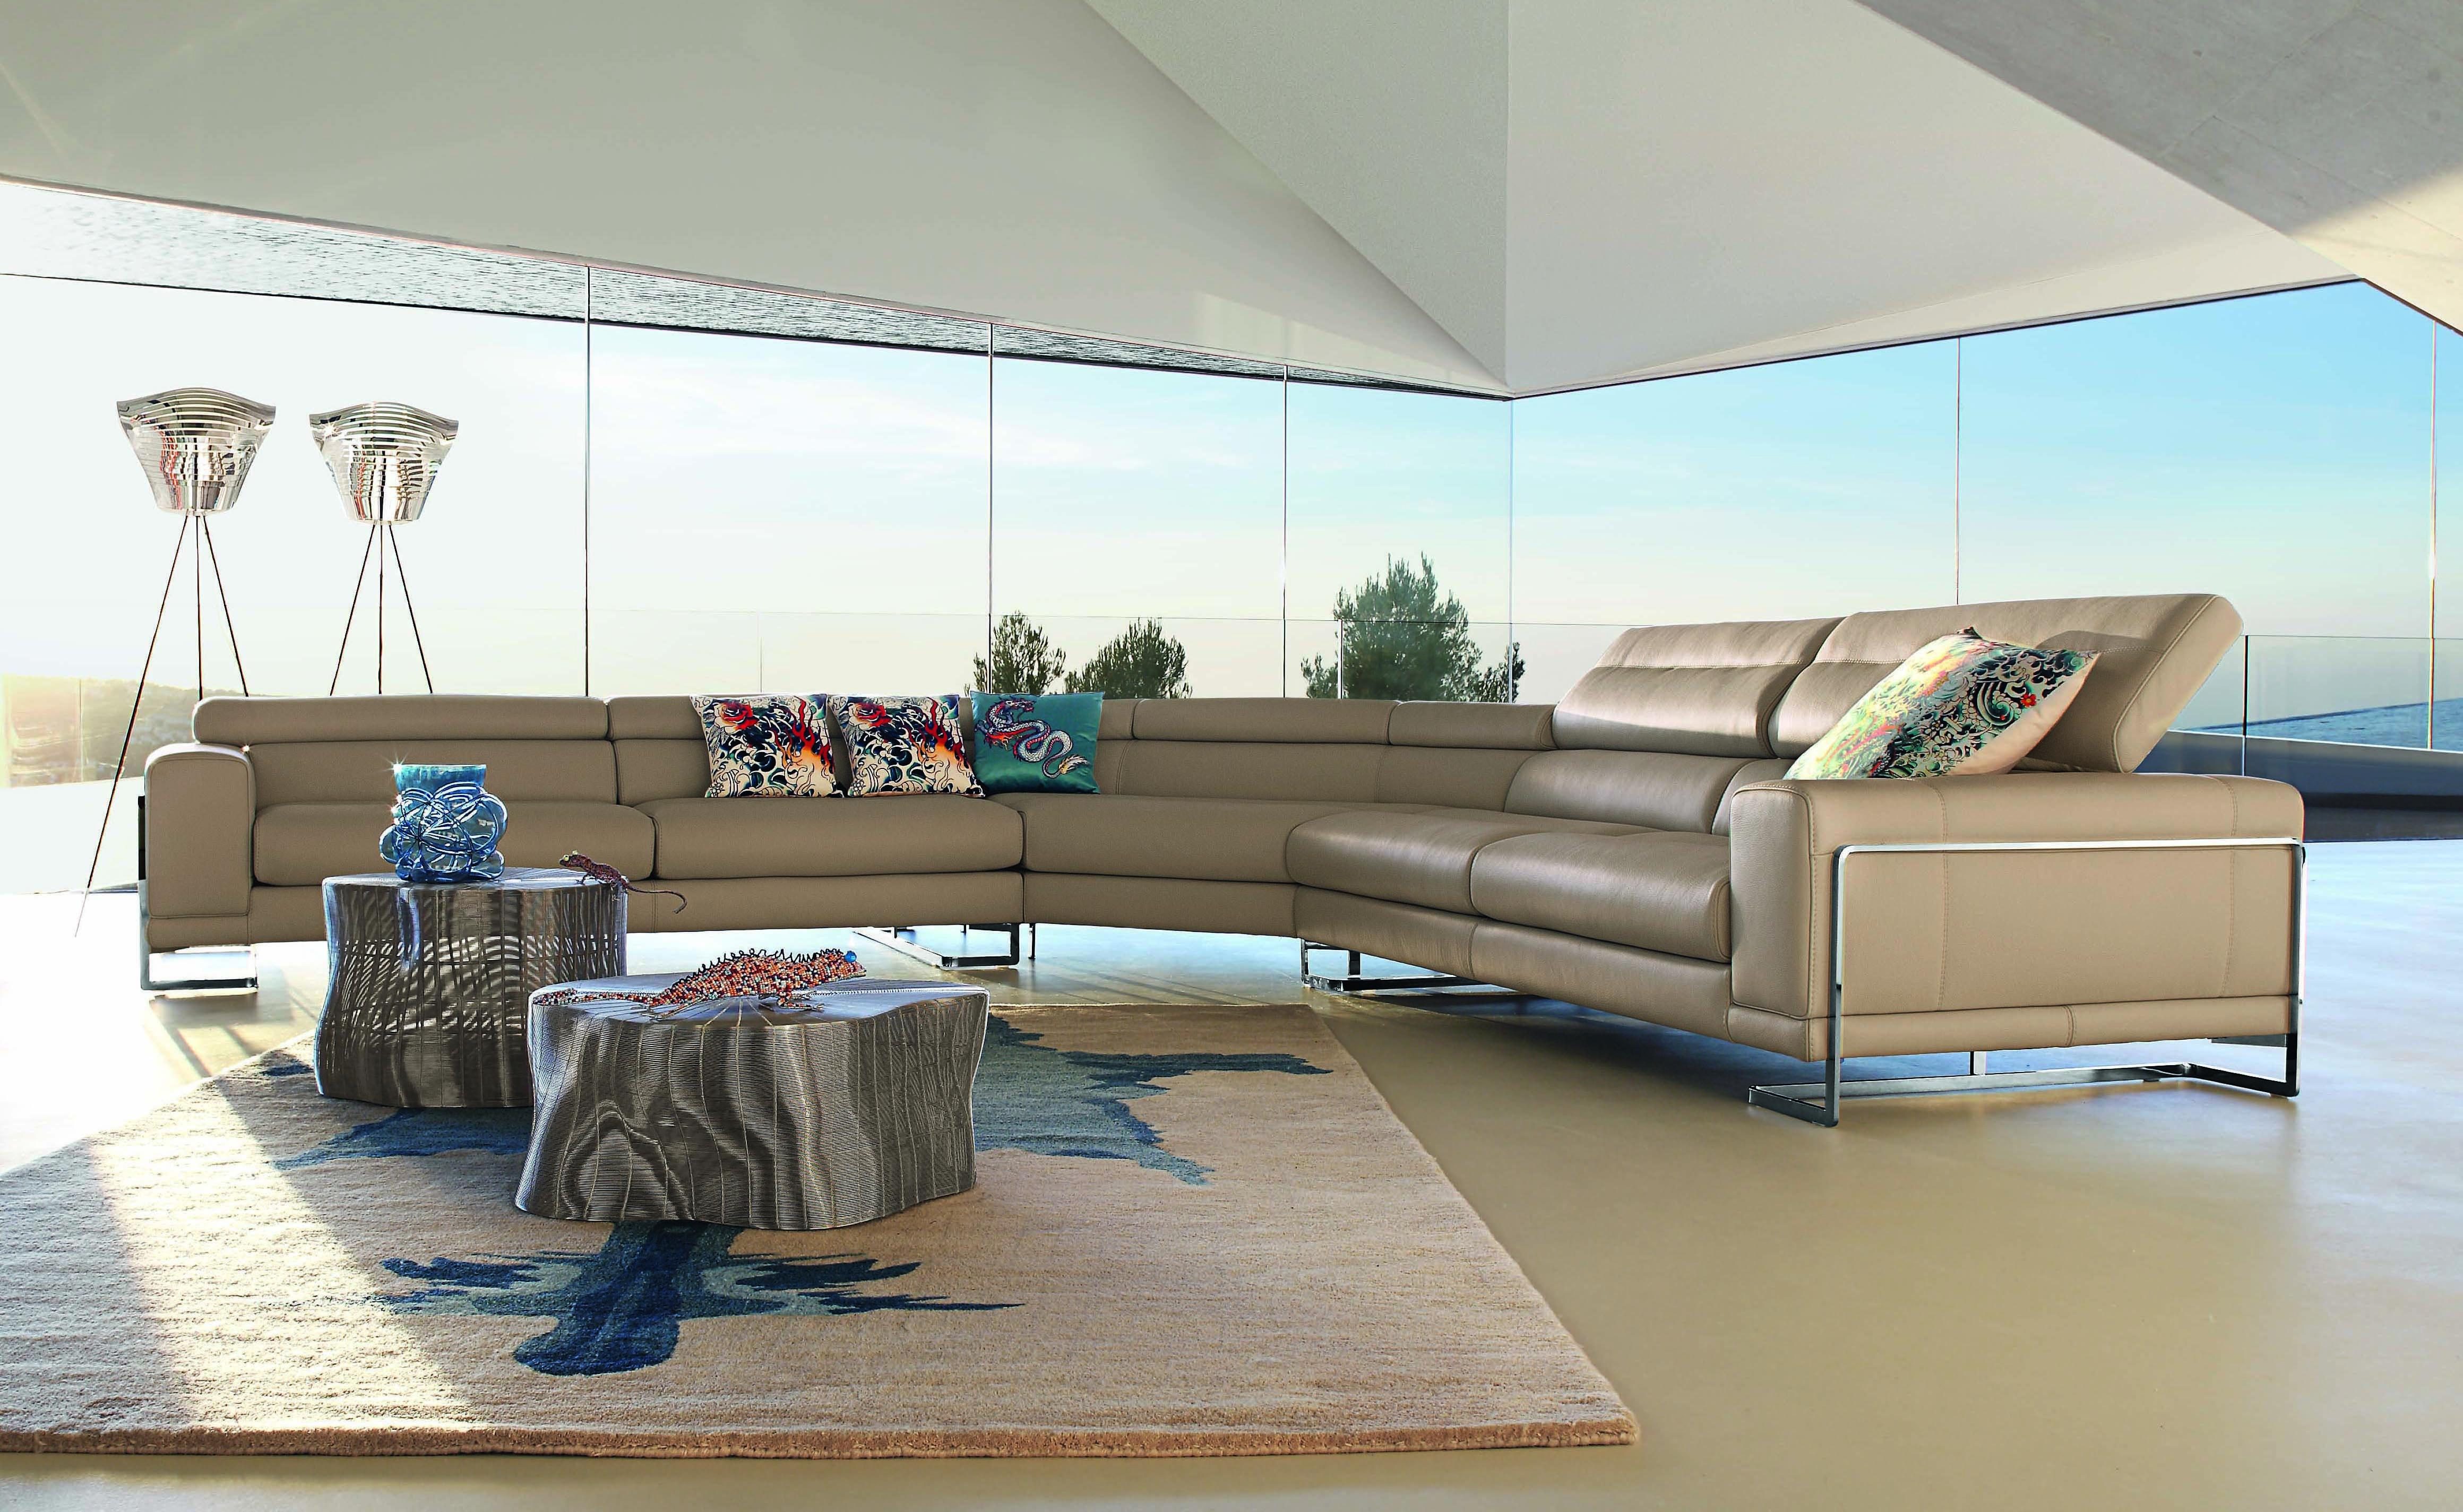 roche bobois theoreme modula sectional sofa design r. Black Bedroom Furniture Sets. Home Design Ideas